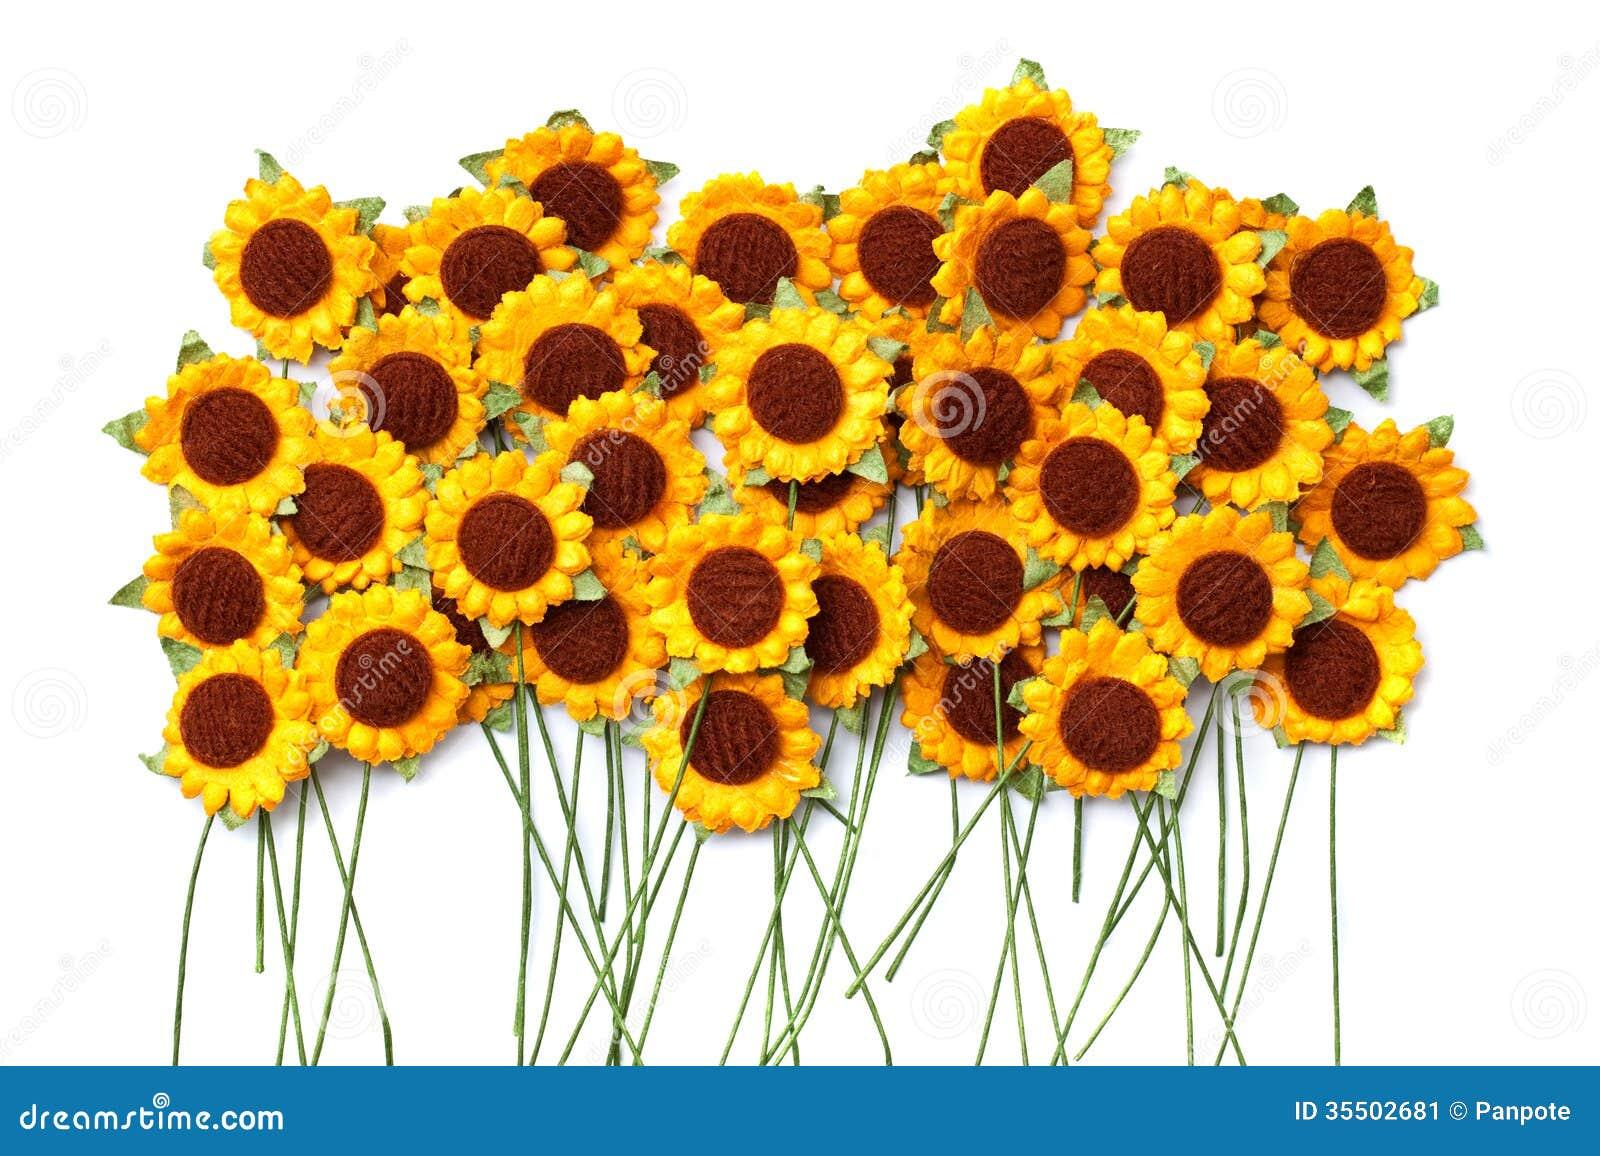 Handicraft Paper Flower Stock Image Image Of Artistic 35502681